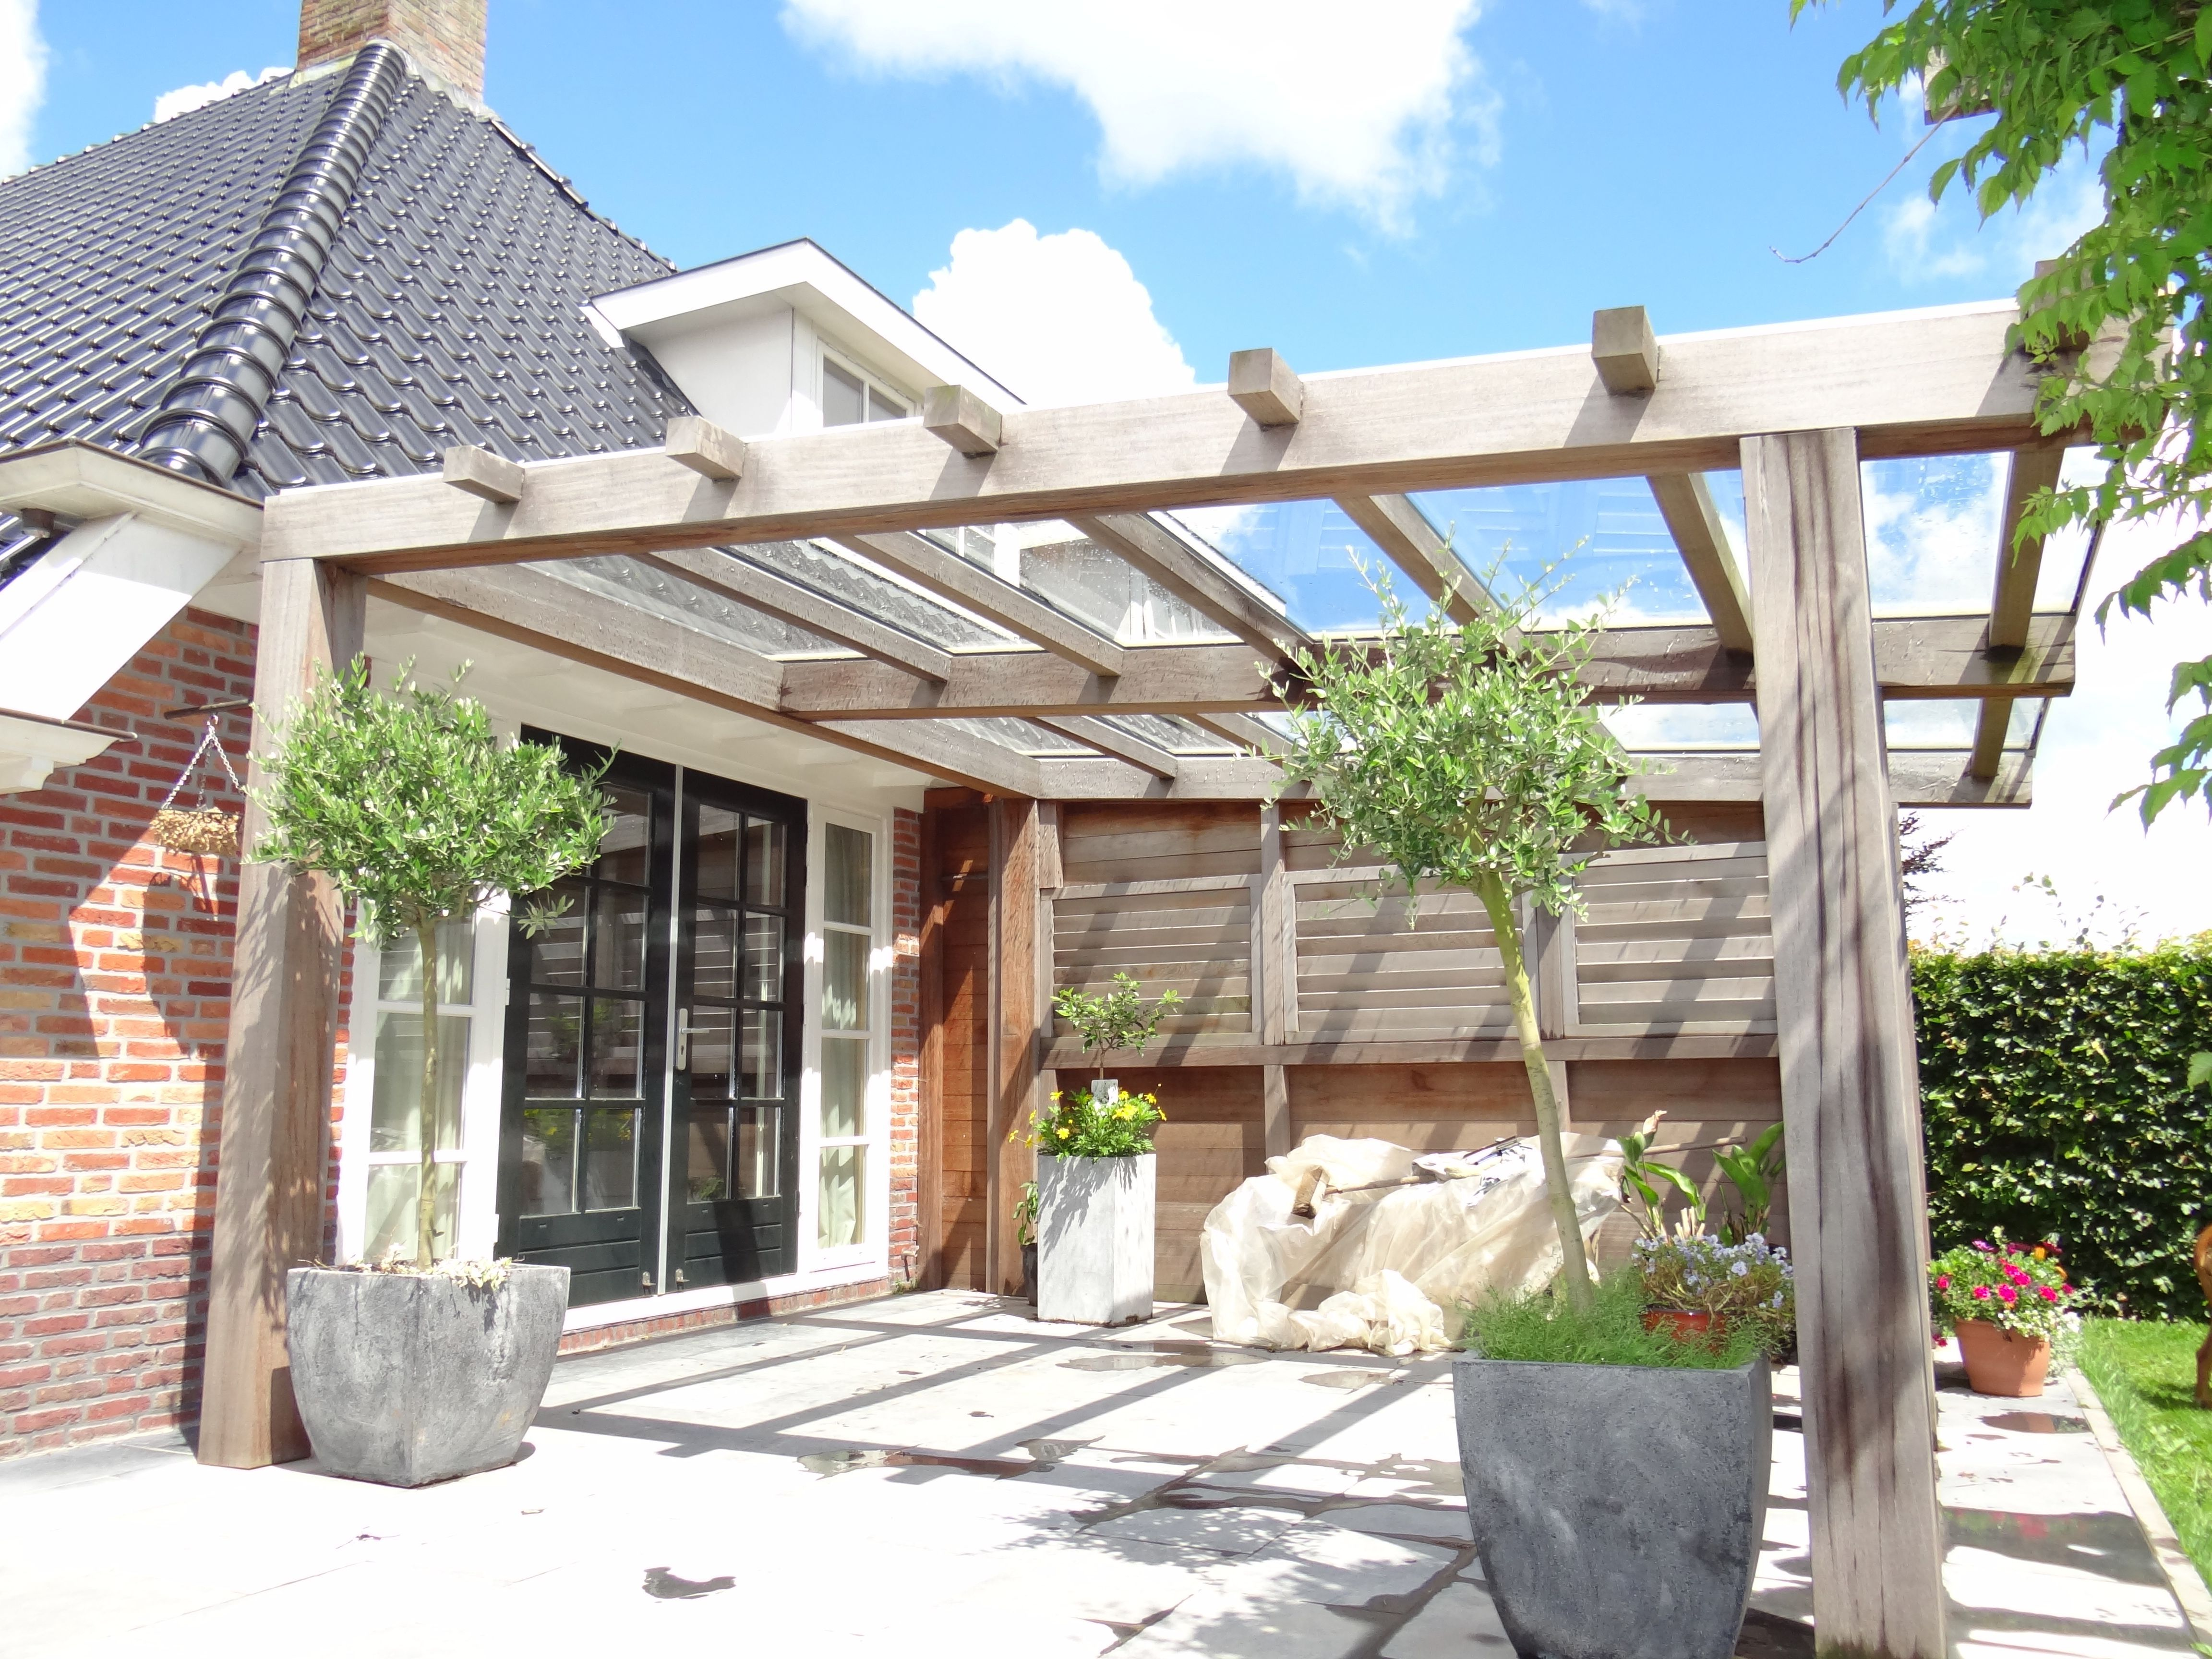 terrassen berdachung haus pinterest. Black Bedroom Furniture Sets. Home Design Ideas